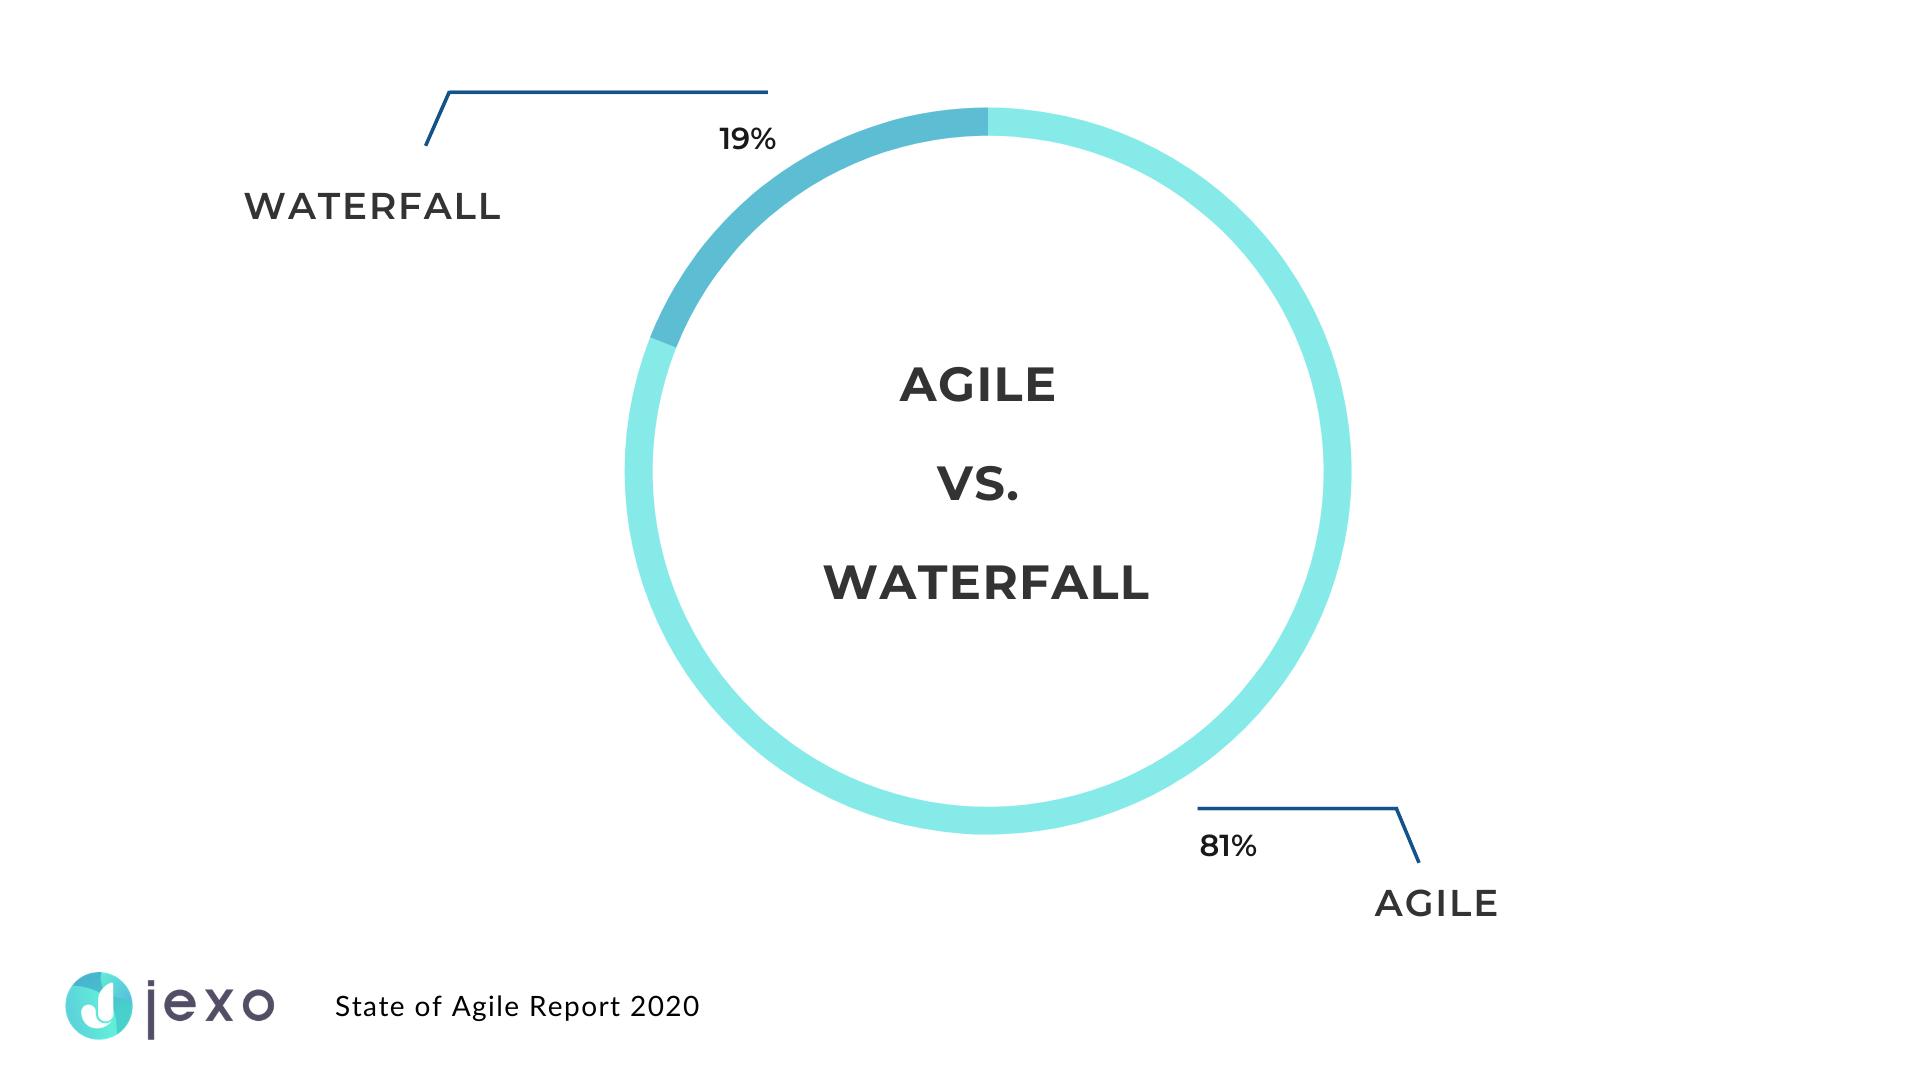 Majority of organizations uses Agile